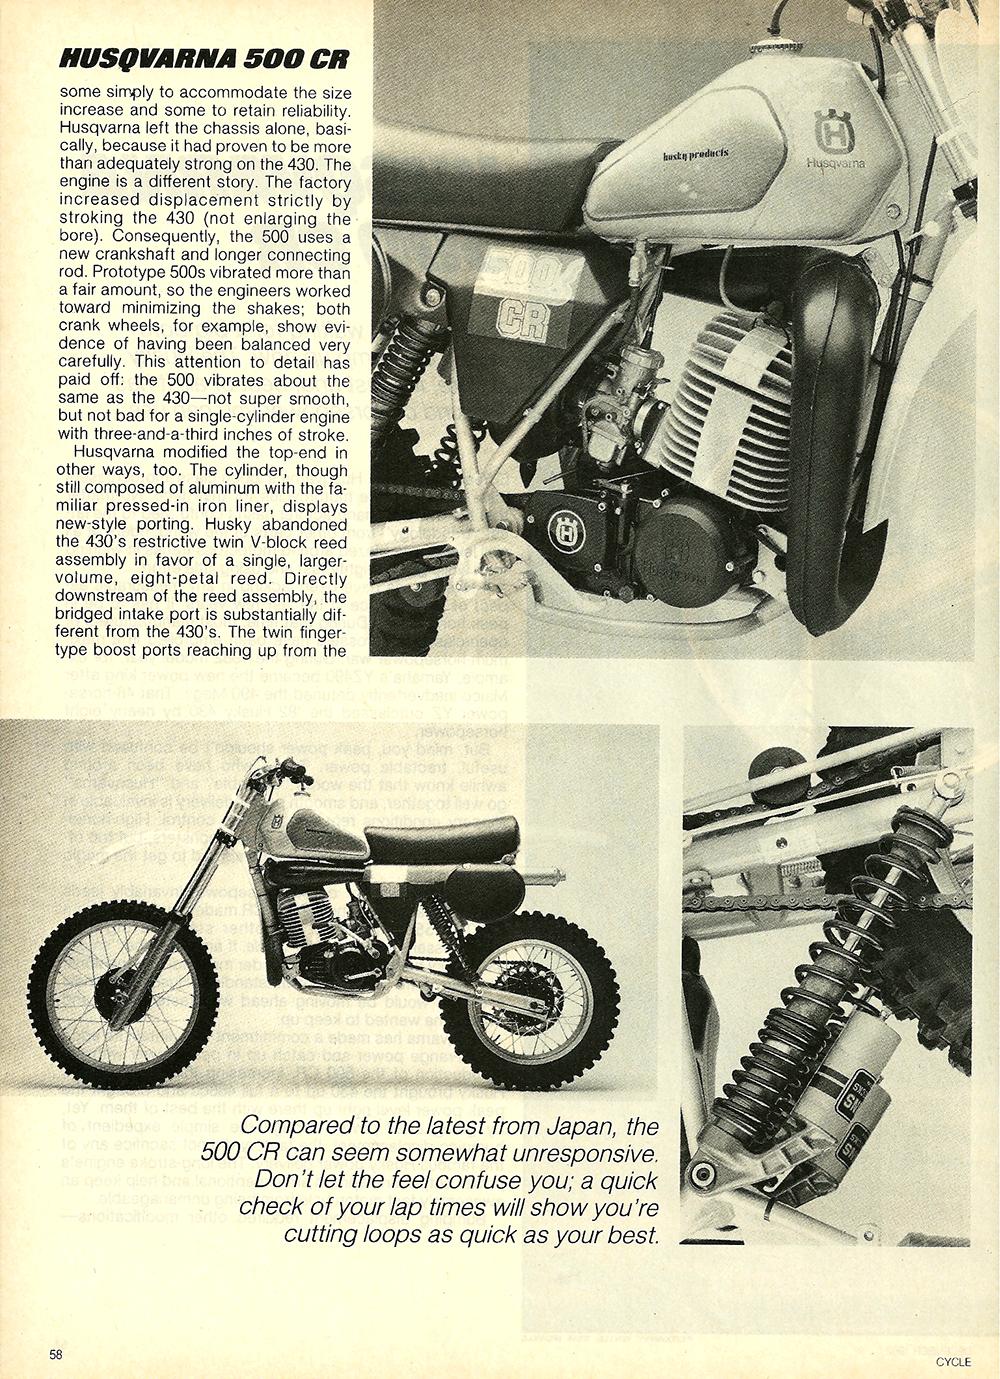 1983 Husqvarna 500 CR road test 3.jpg